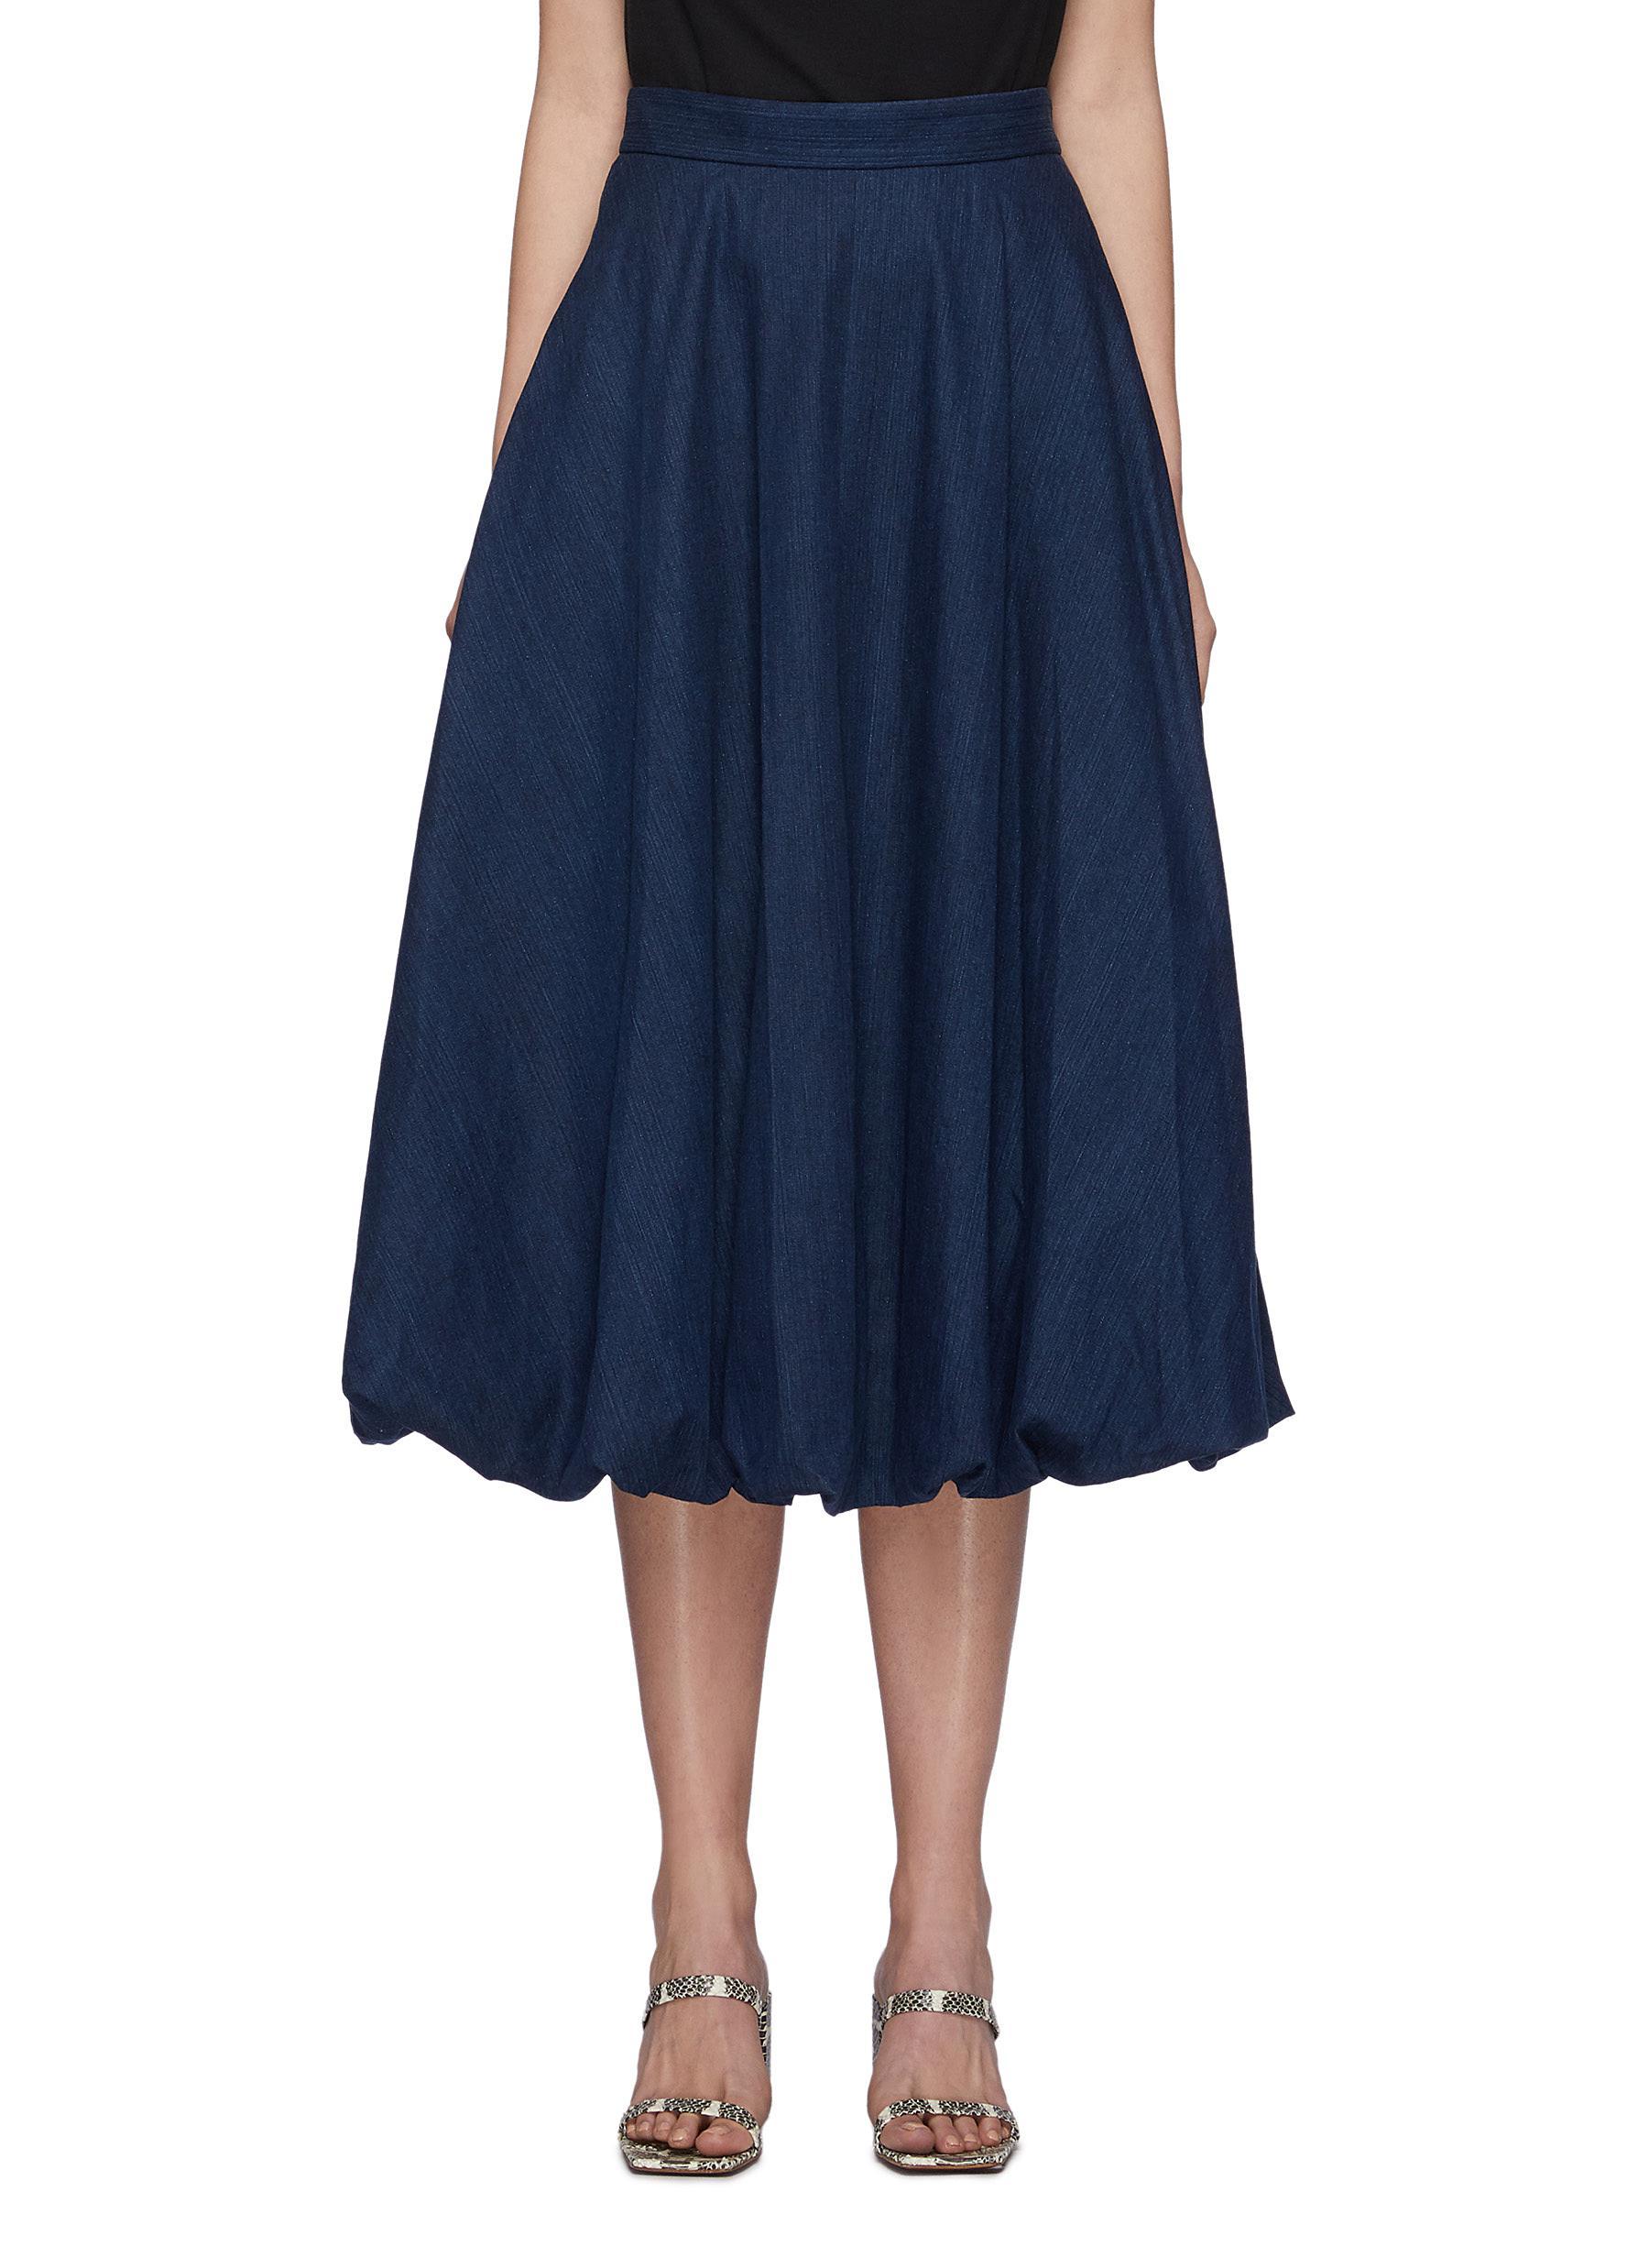 Summer denim bubble skirt - TIBI - Modalova